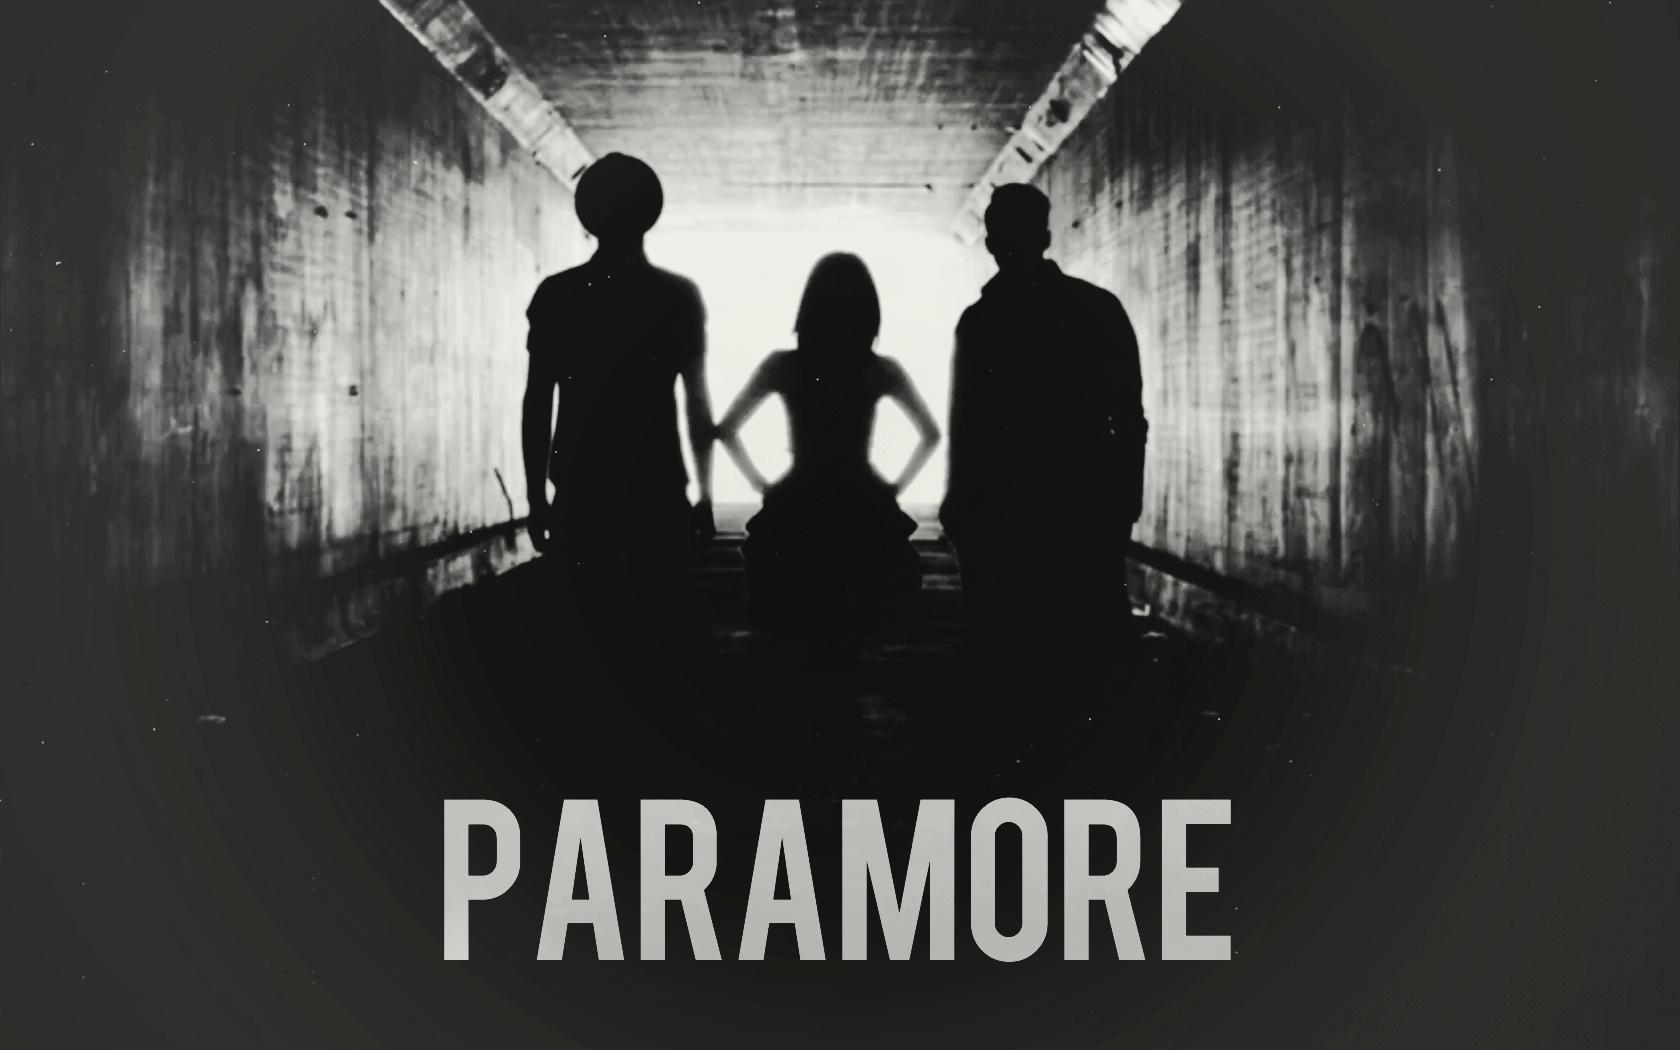 Papel de Parede Paramore: Sombras Wallpaper para Download no Celular ...